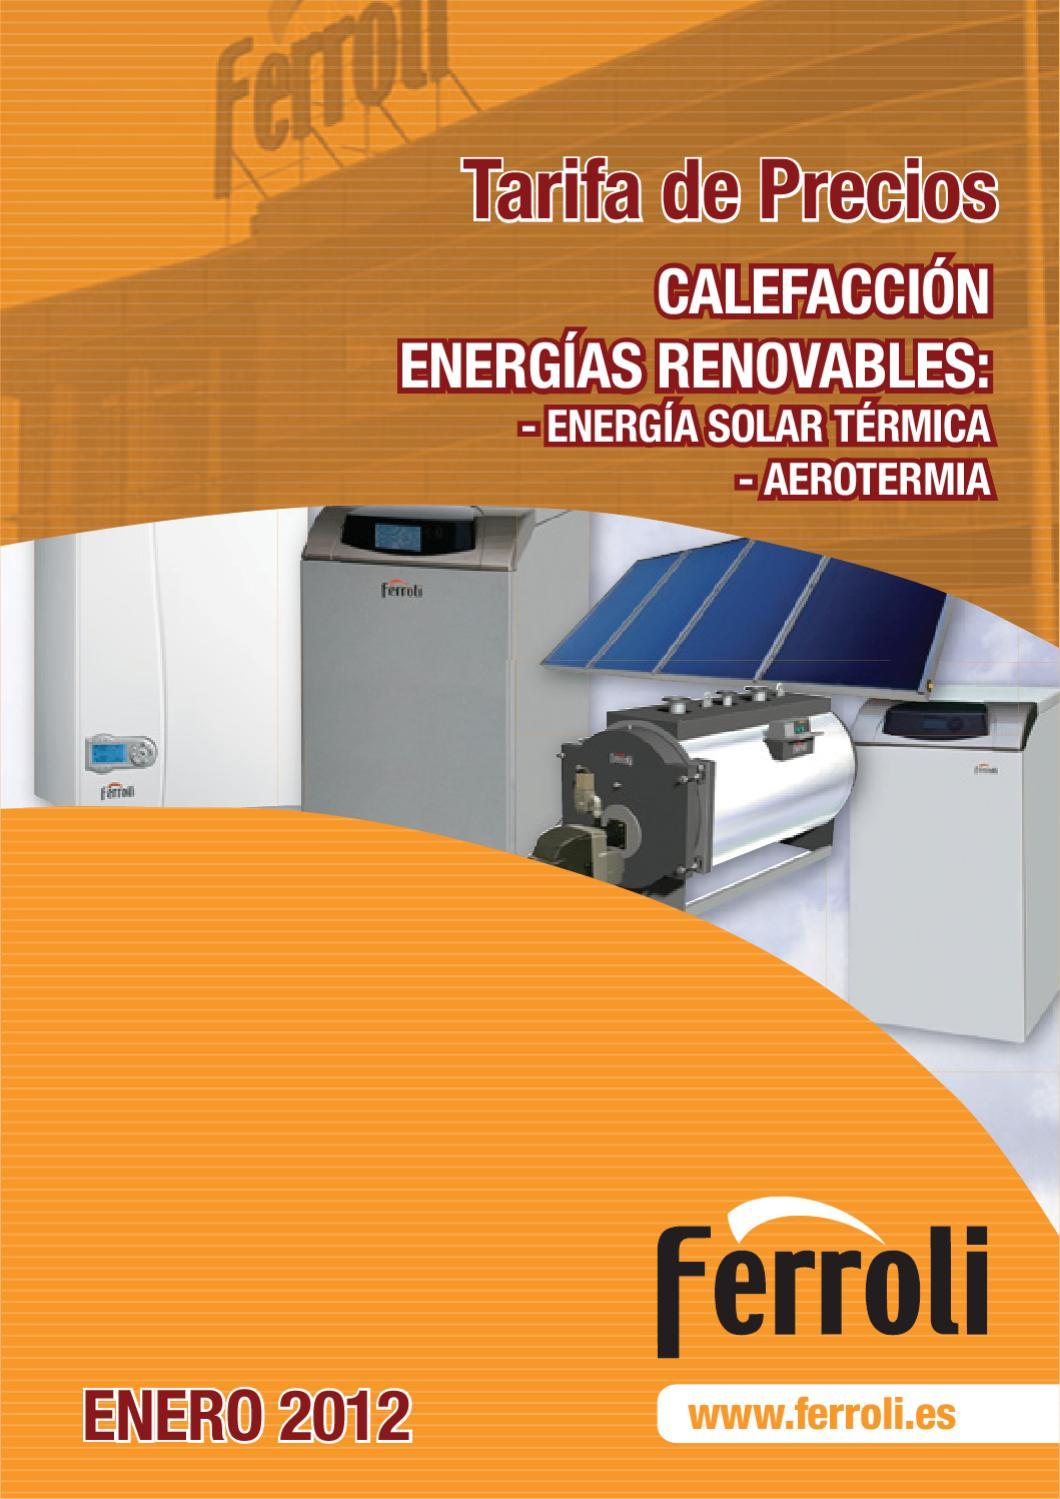 Tarifa calefacci n ferroli enero 2012 by fanair s l issuu for Tarifa roca calefaccion